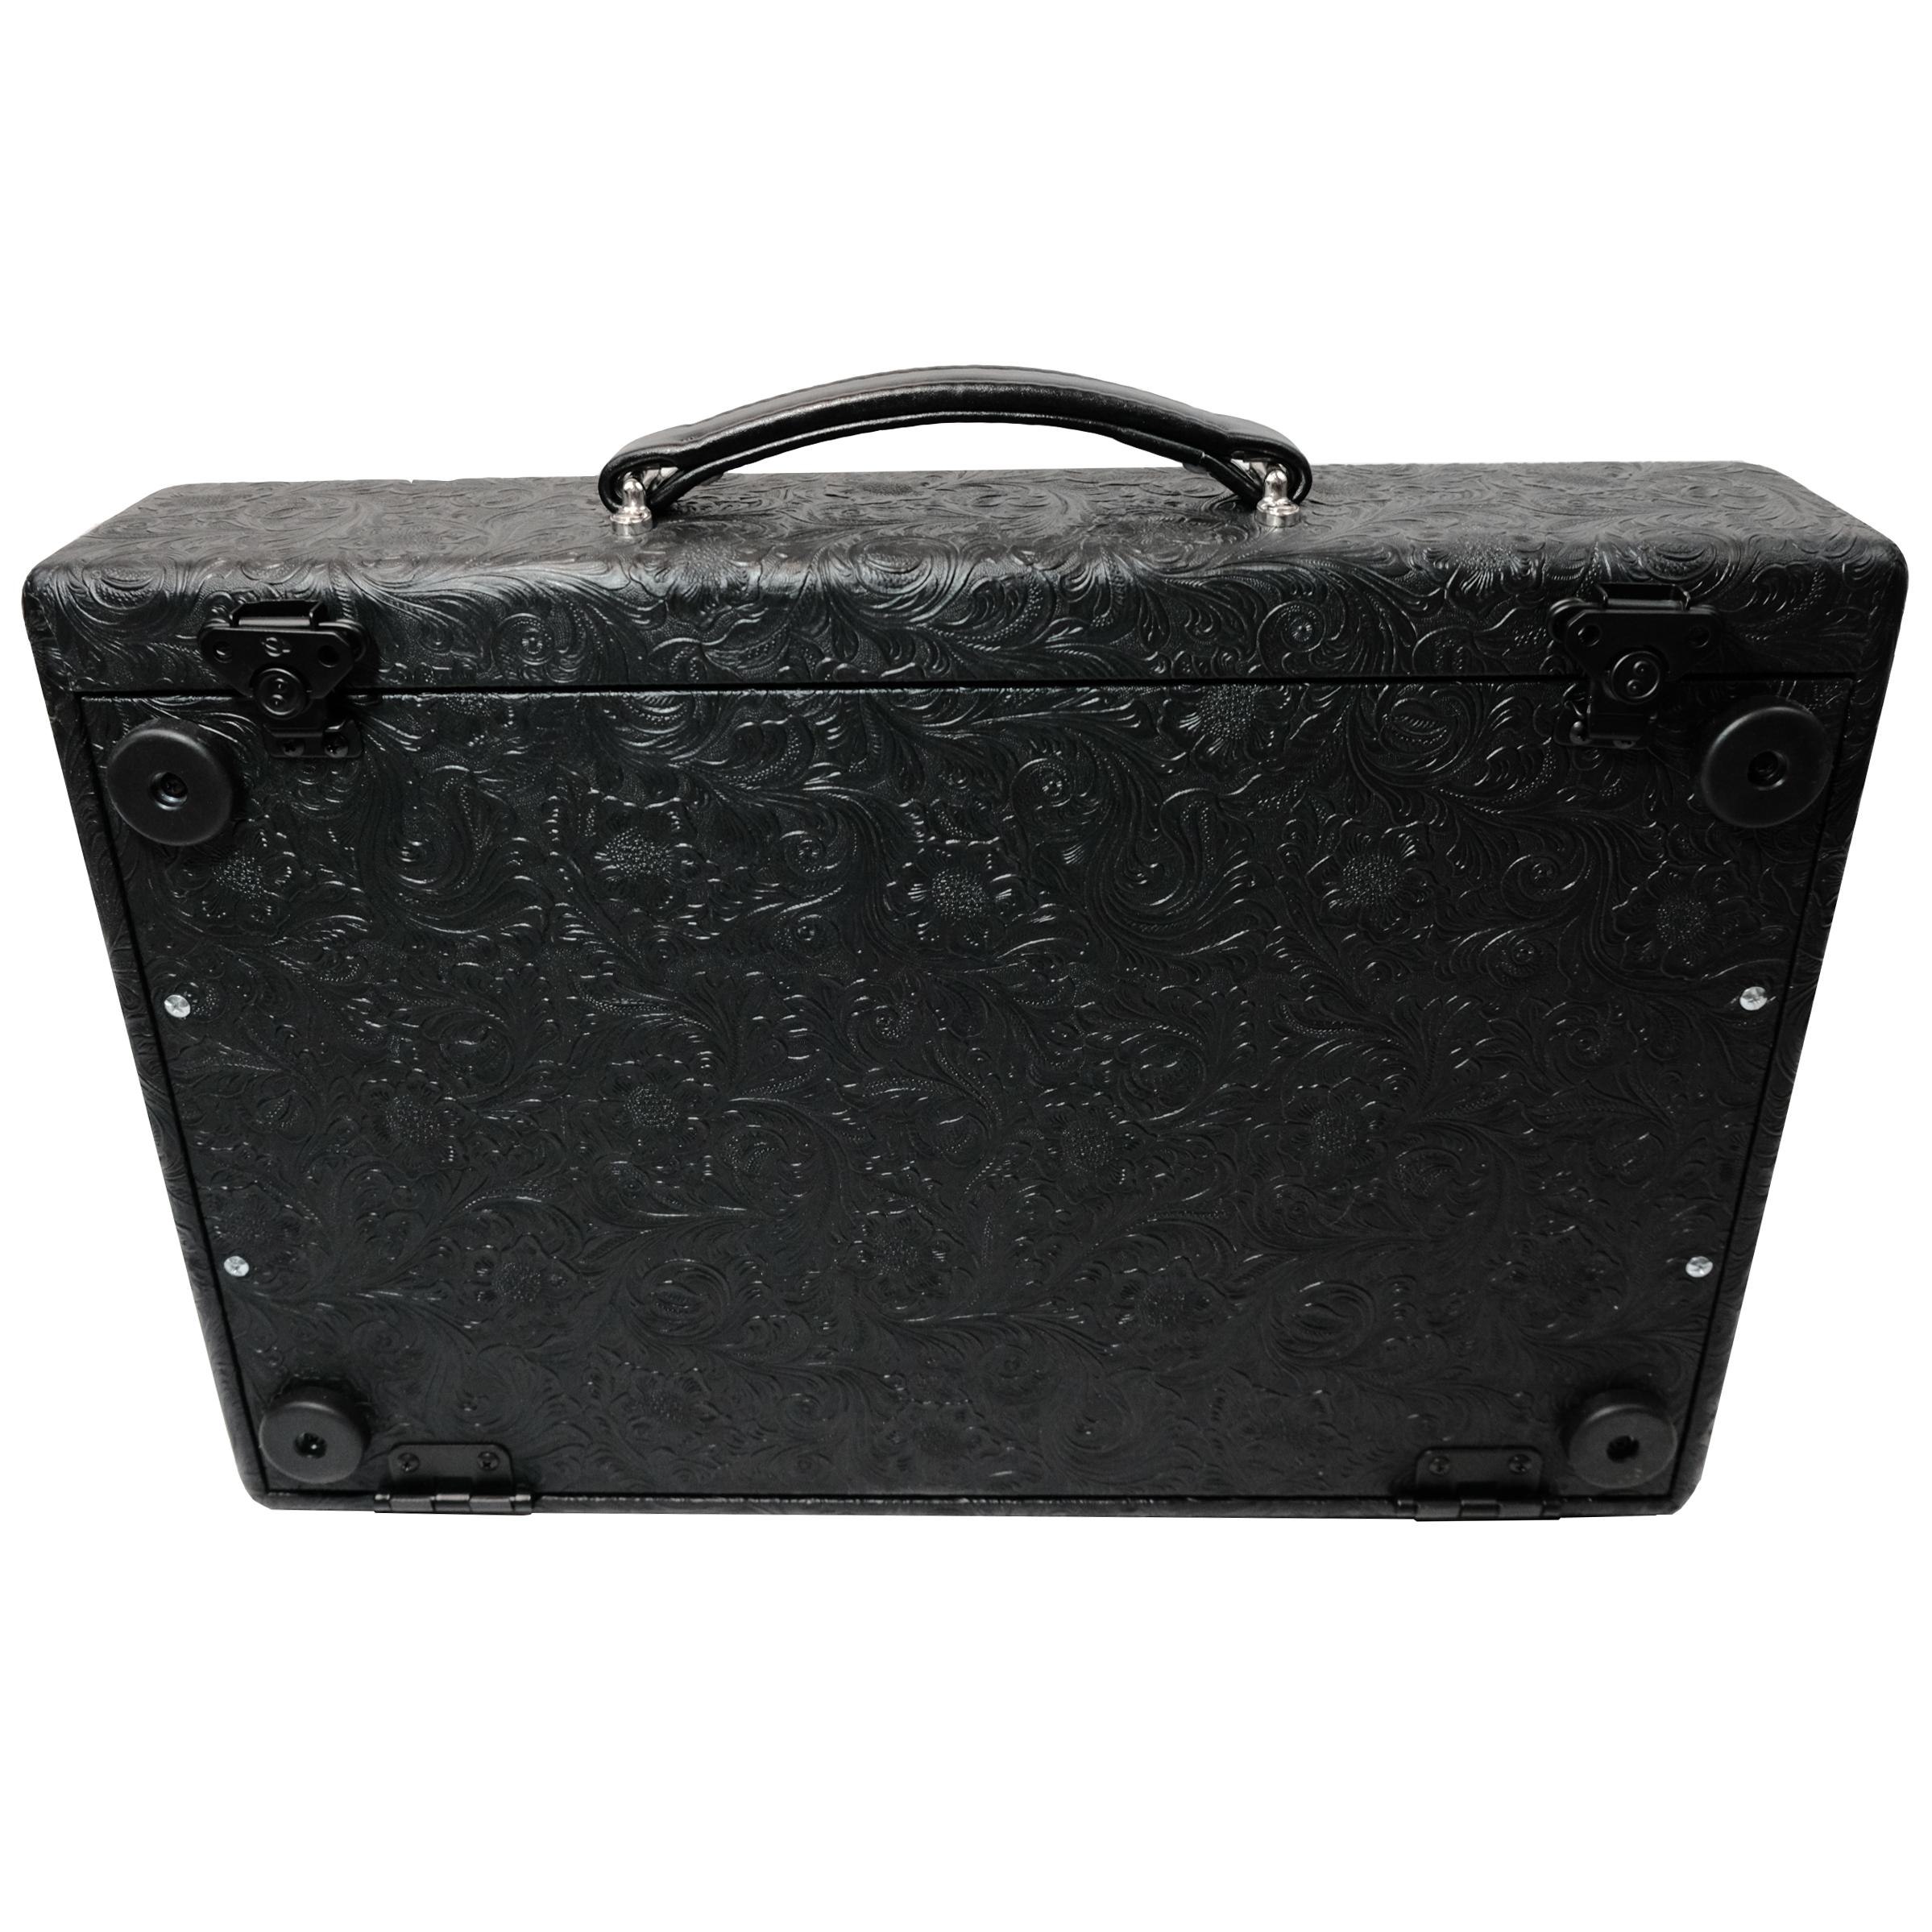 Vbooutique 12 x 20 modern vintage suitcase pedalboard